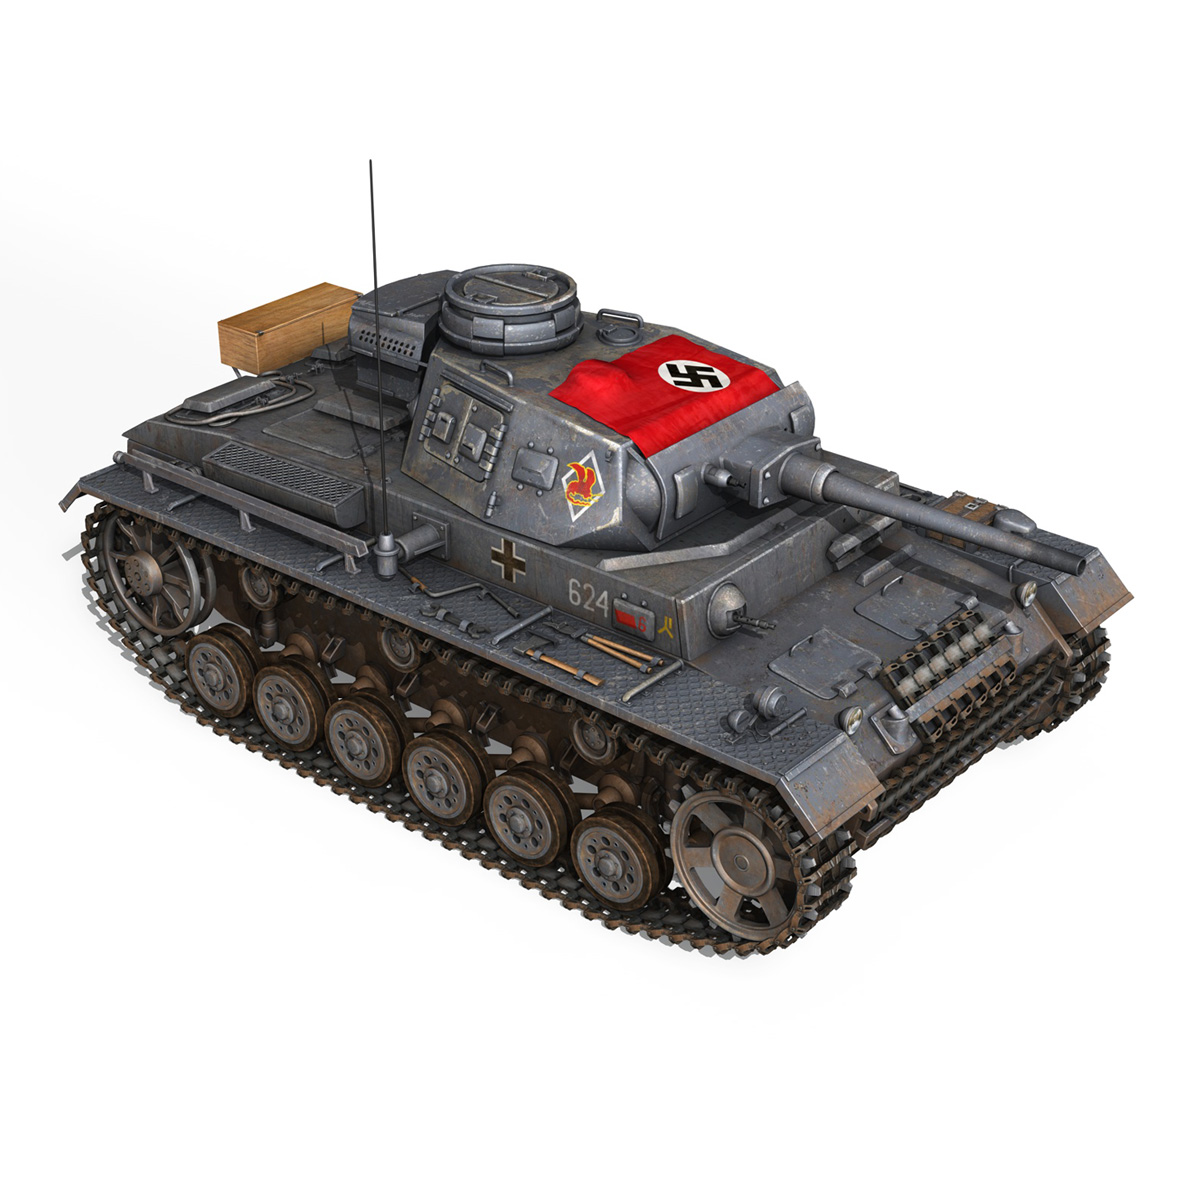 pzkpfw iii – panzer 3 – ausf.j – 624 3d model 3ds fbx lwo lw lws obj c4d 265305